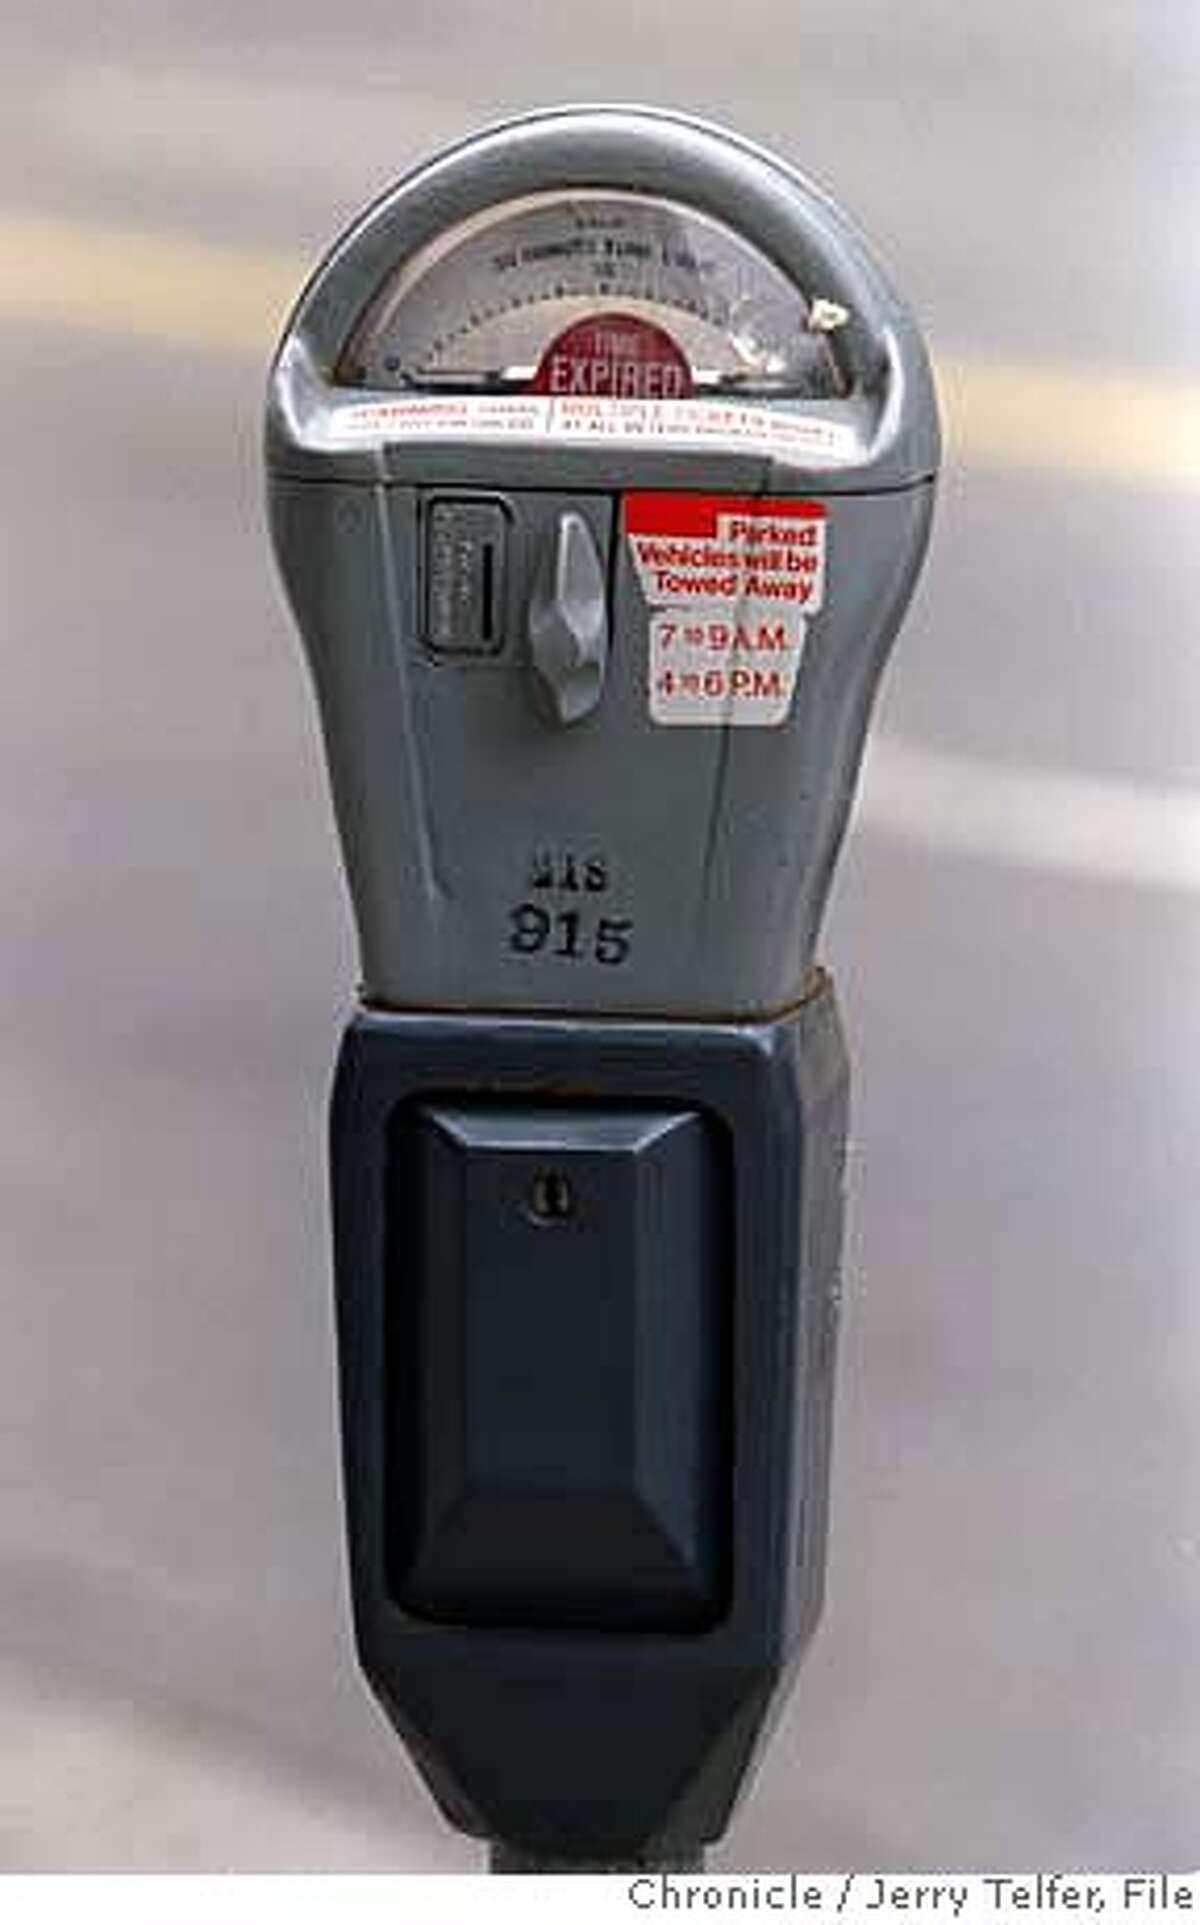 PARKING1/C/02JUL98/MN/JLT SF parking meter, showing